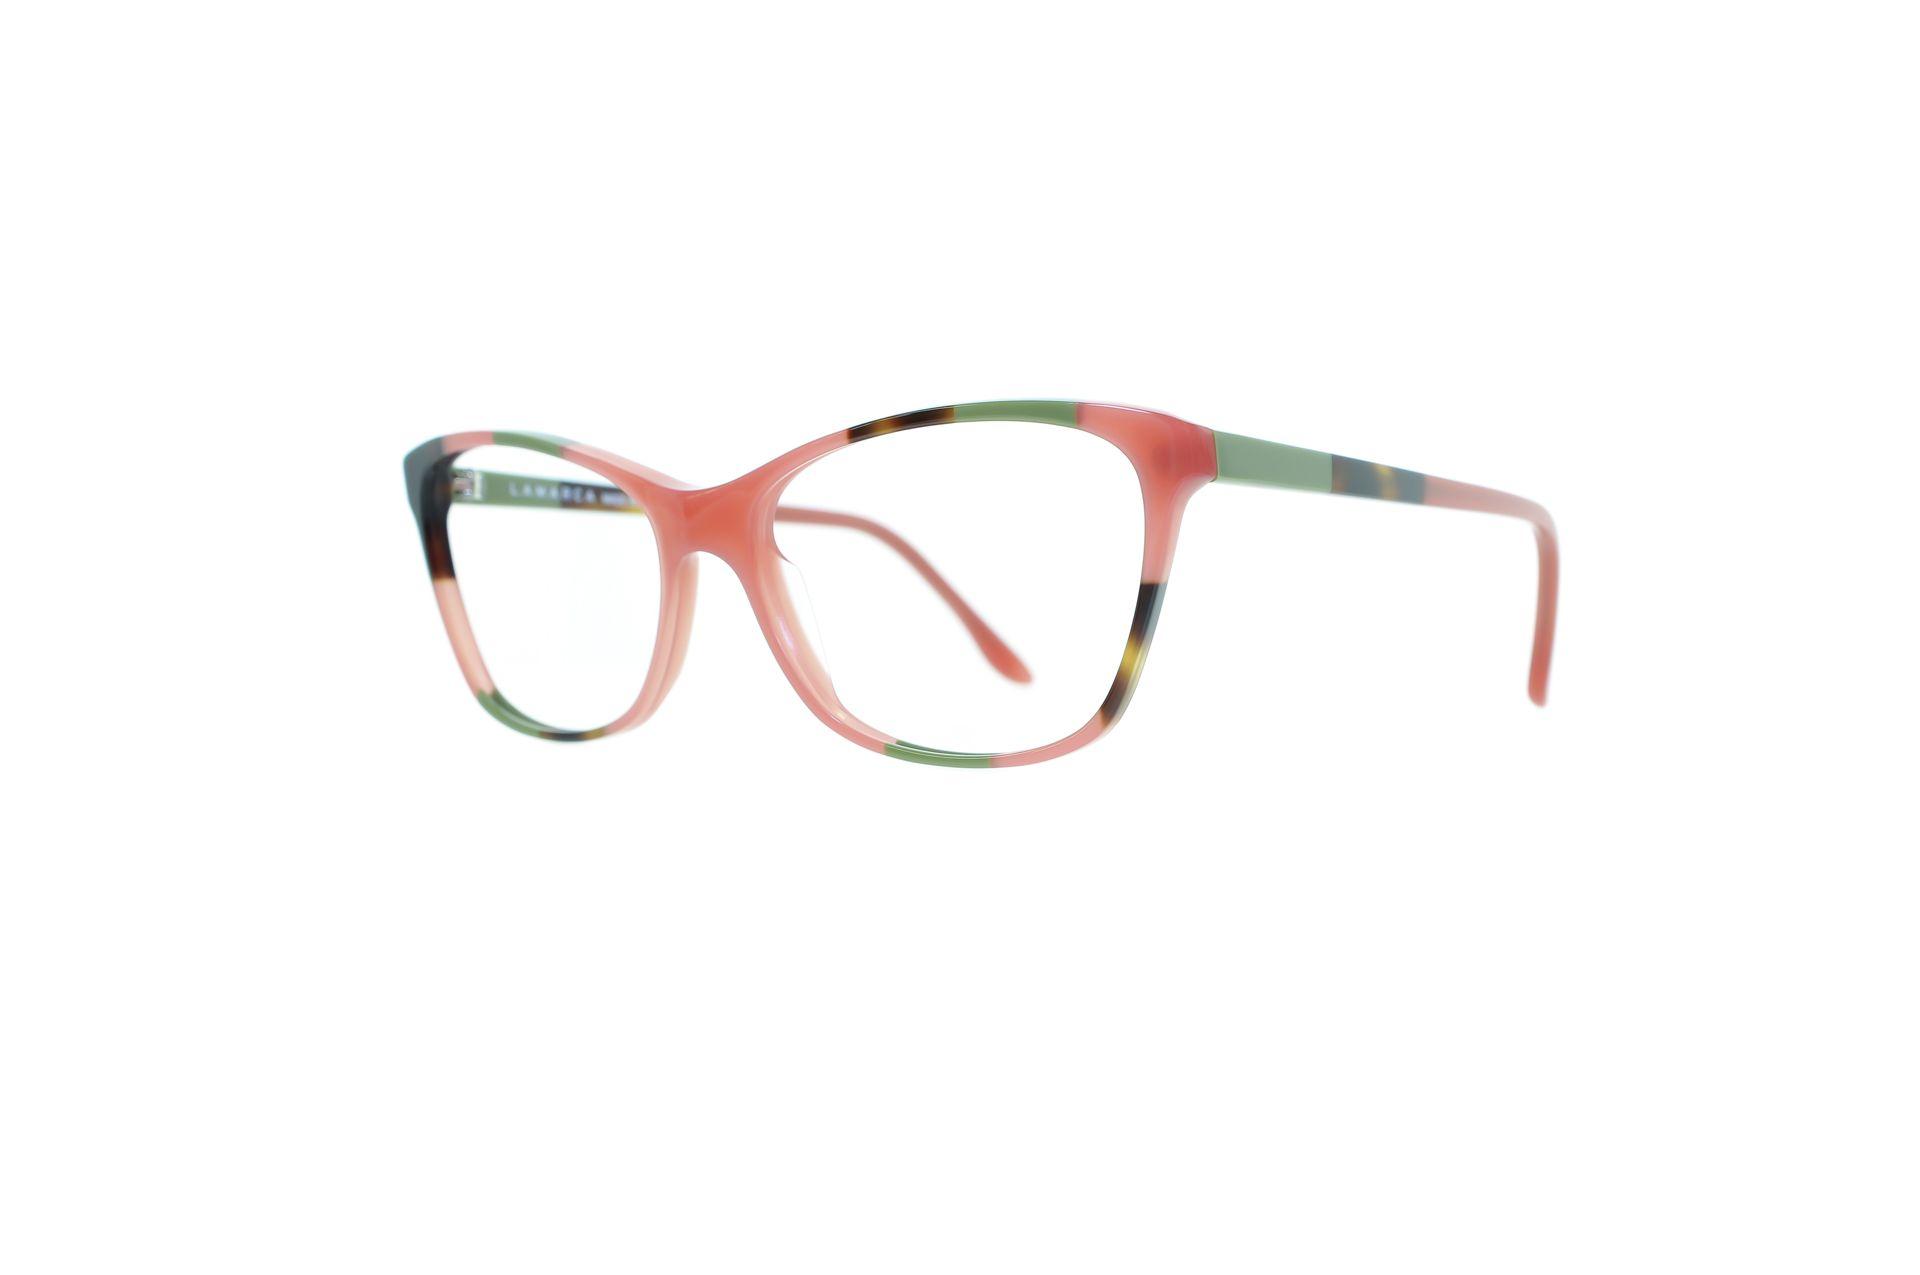 Occhiali da Vista Zac Posen ARLETTY BL iCo3sx1eN